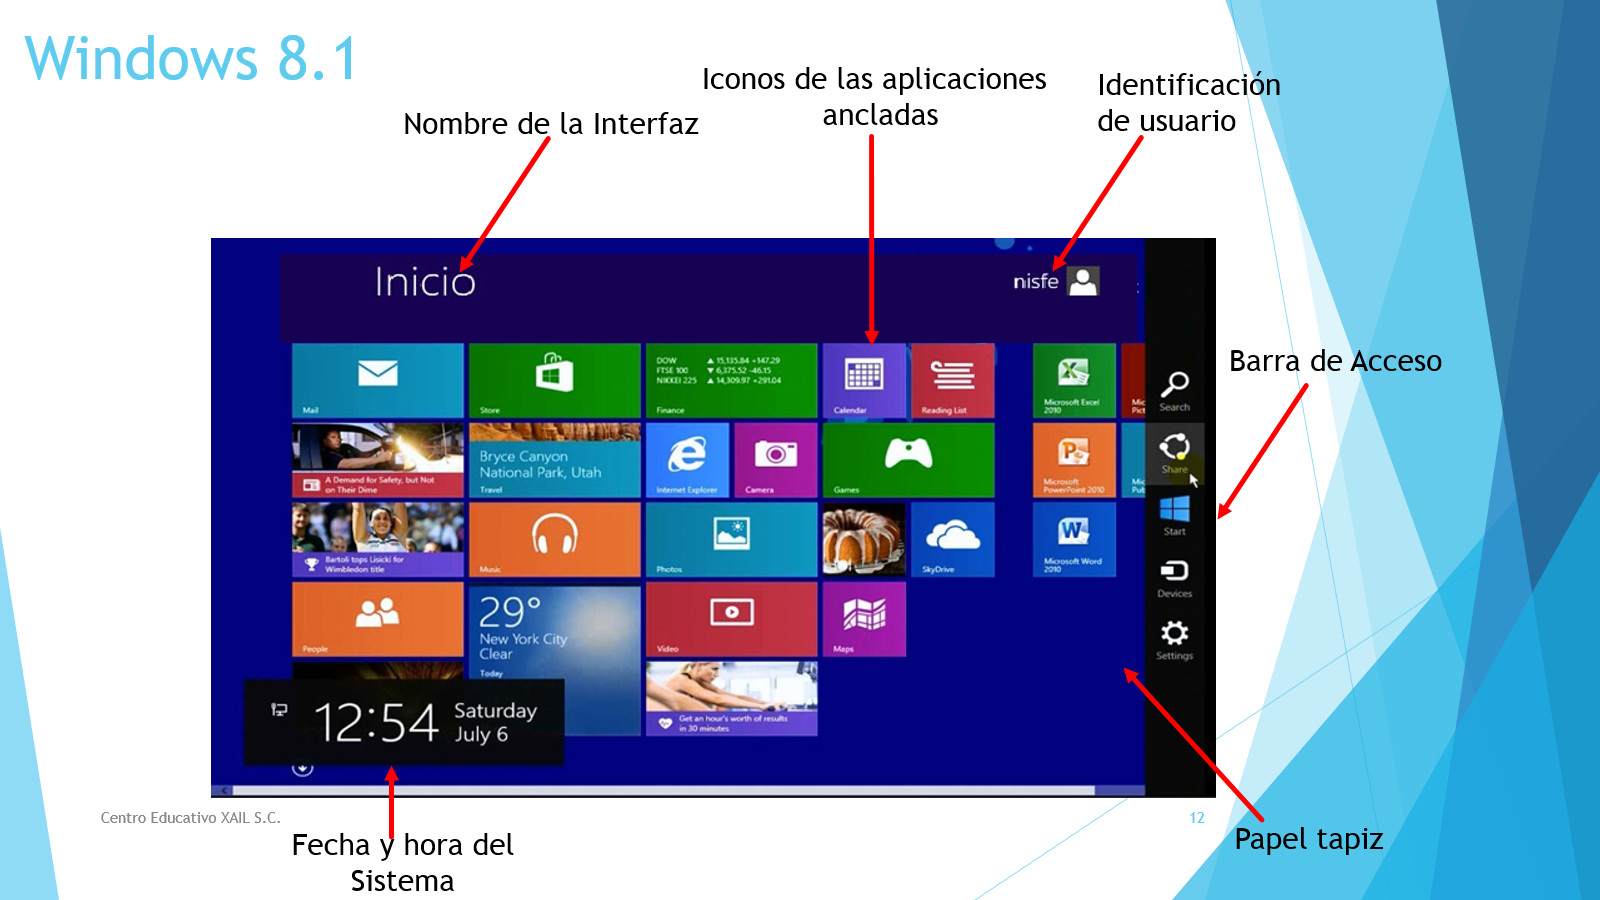 Dise o en inform tica windows 8 1 for Diseno arquitectonico informatica